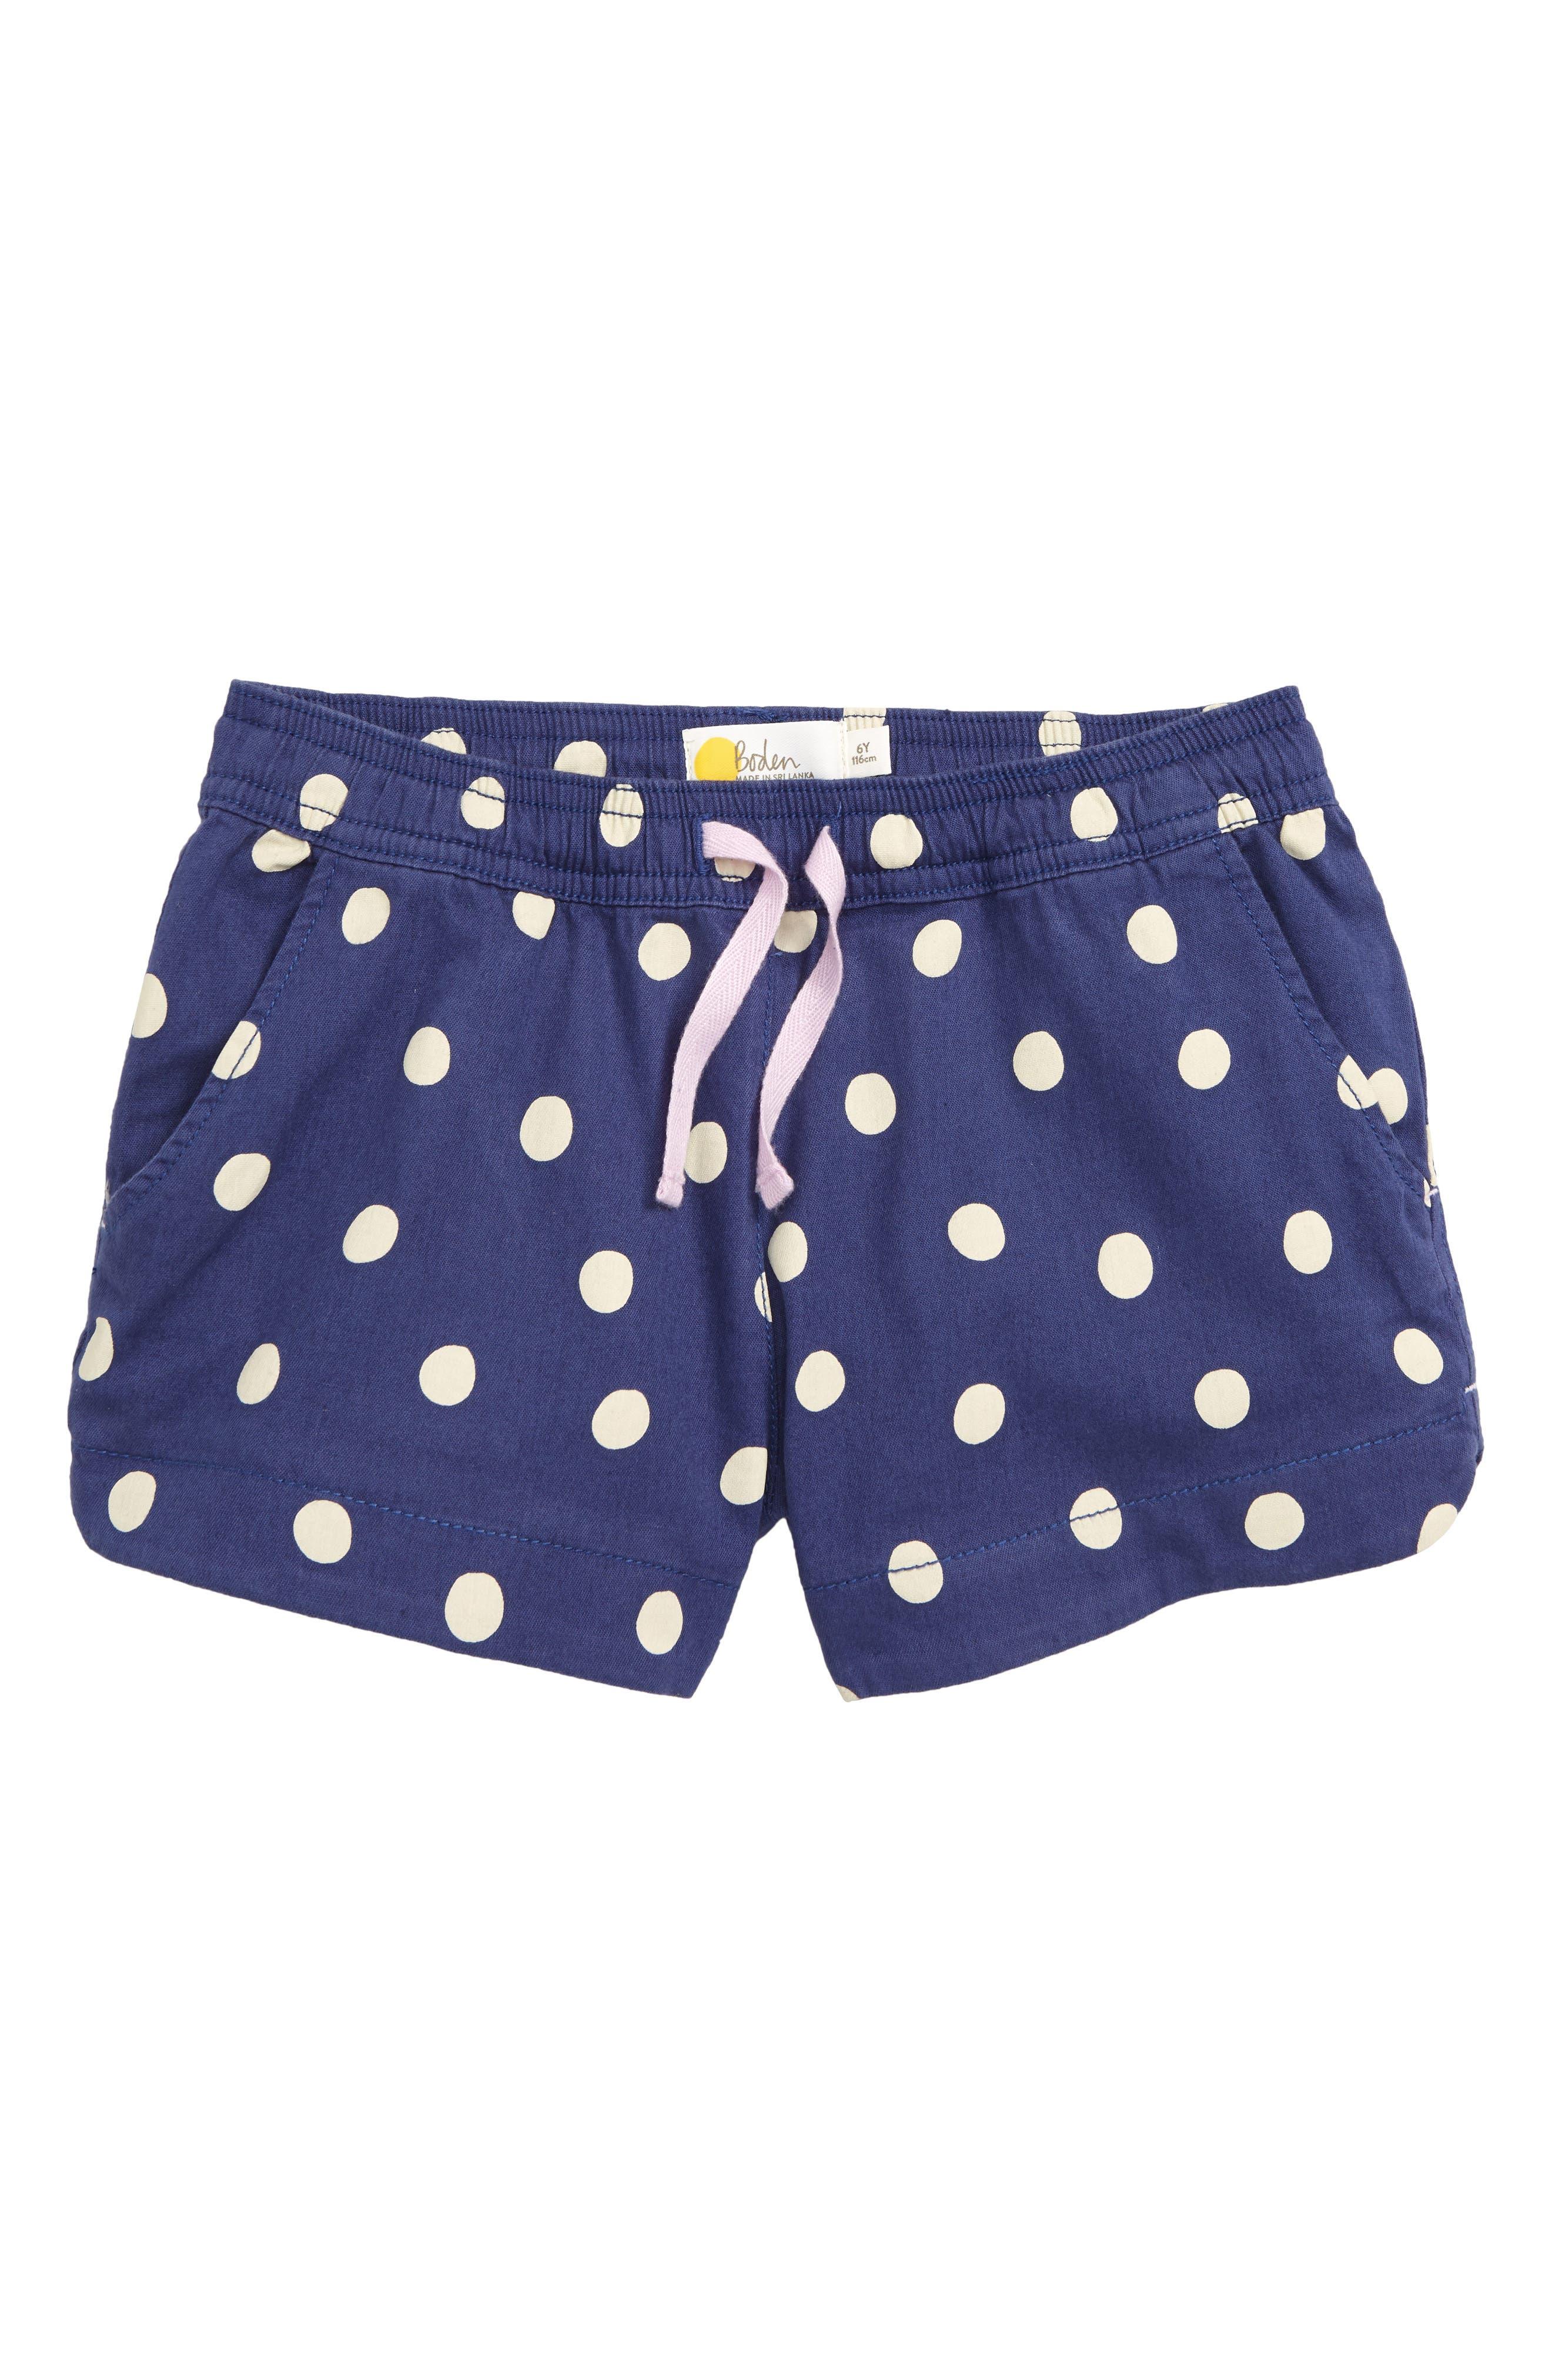 BODEN Heart Pocket Shorts, Main, color, BLU STARBOARD BLUE/ ECRU SPOT